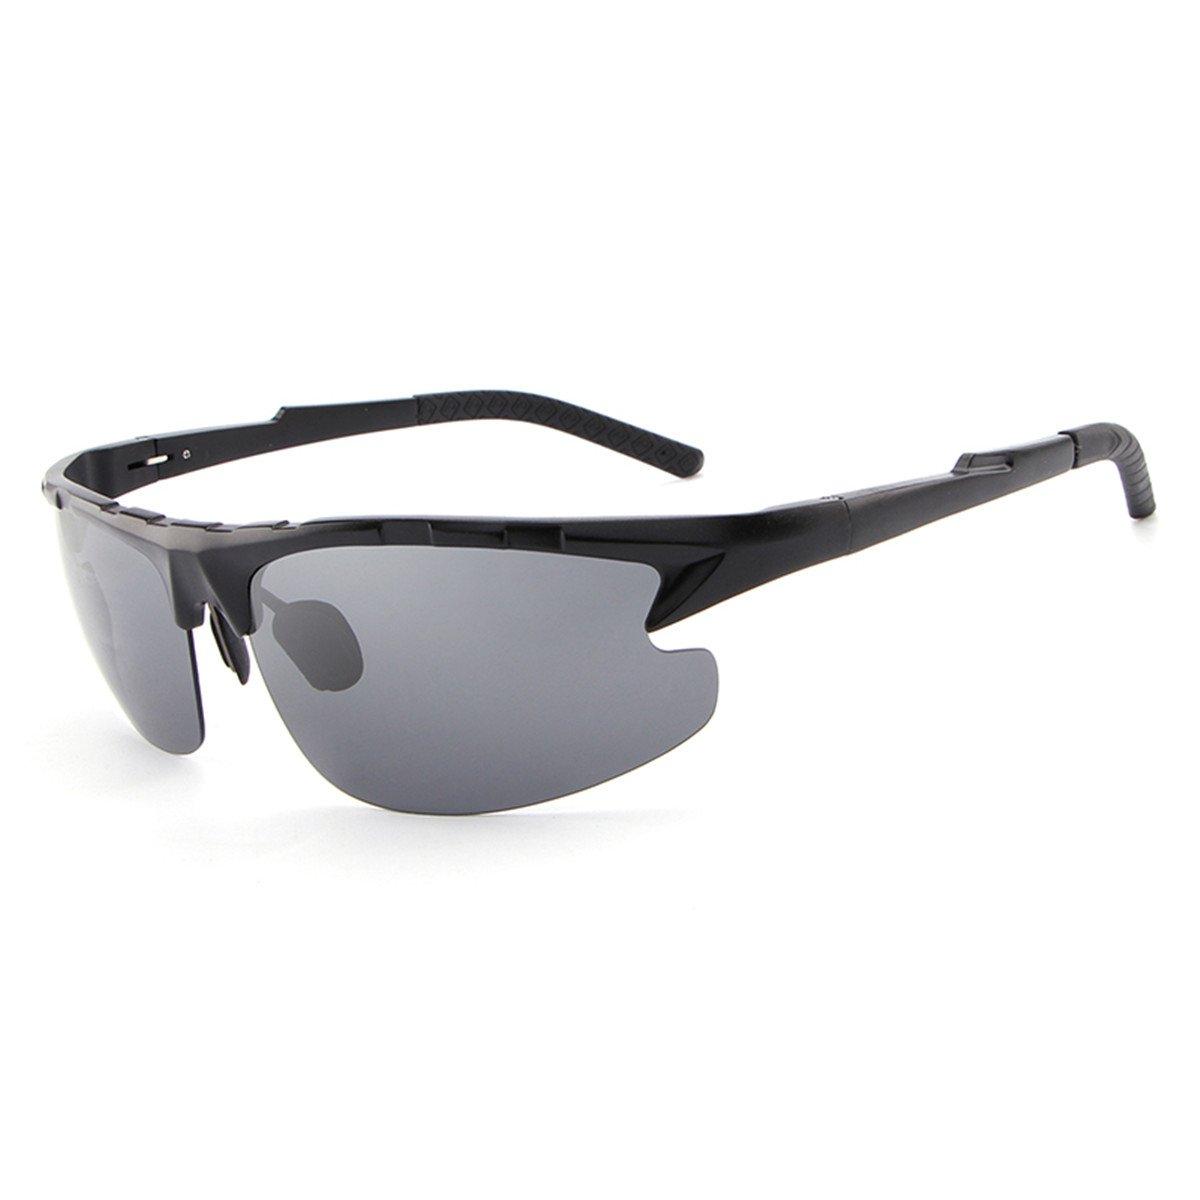 e603e3f32e2 HDCRAFTER Men Sunglasses Outdoor Sport UV400 Polarized Cycling Sunglasses  E003 (Black